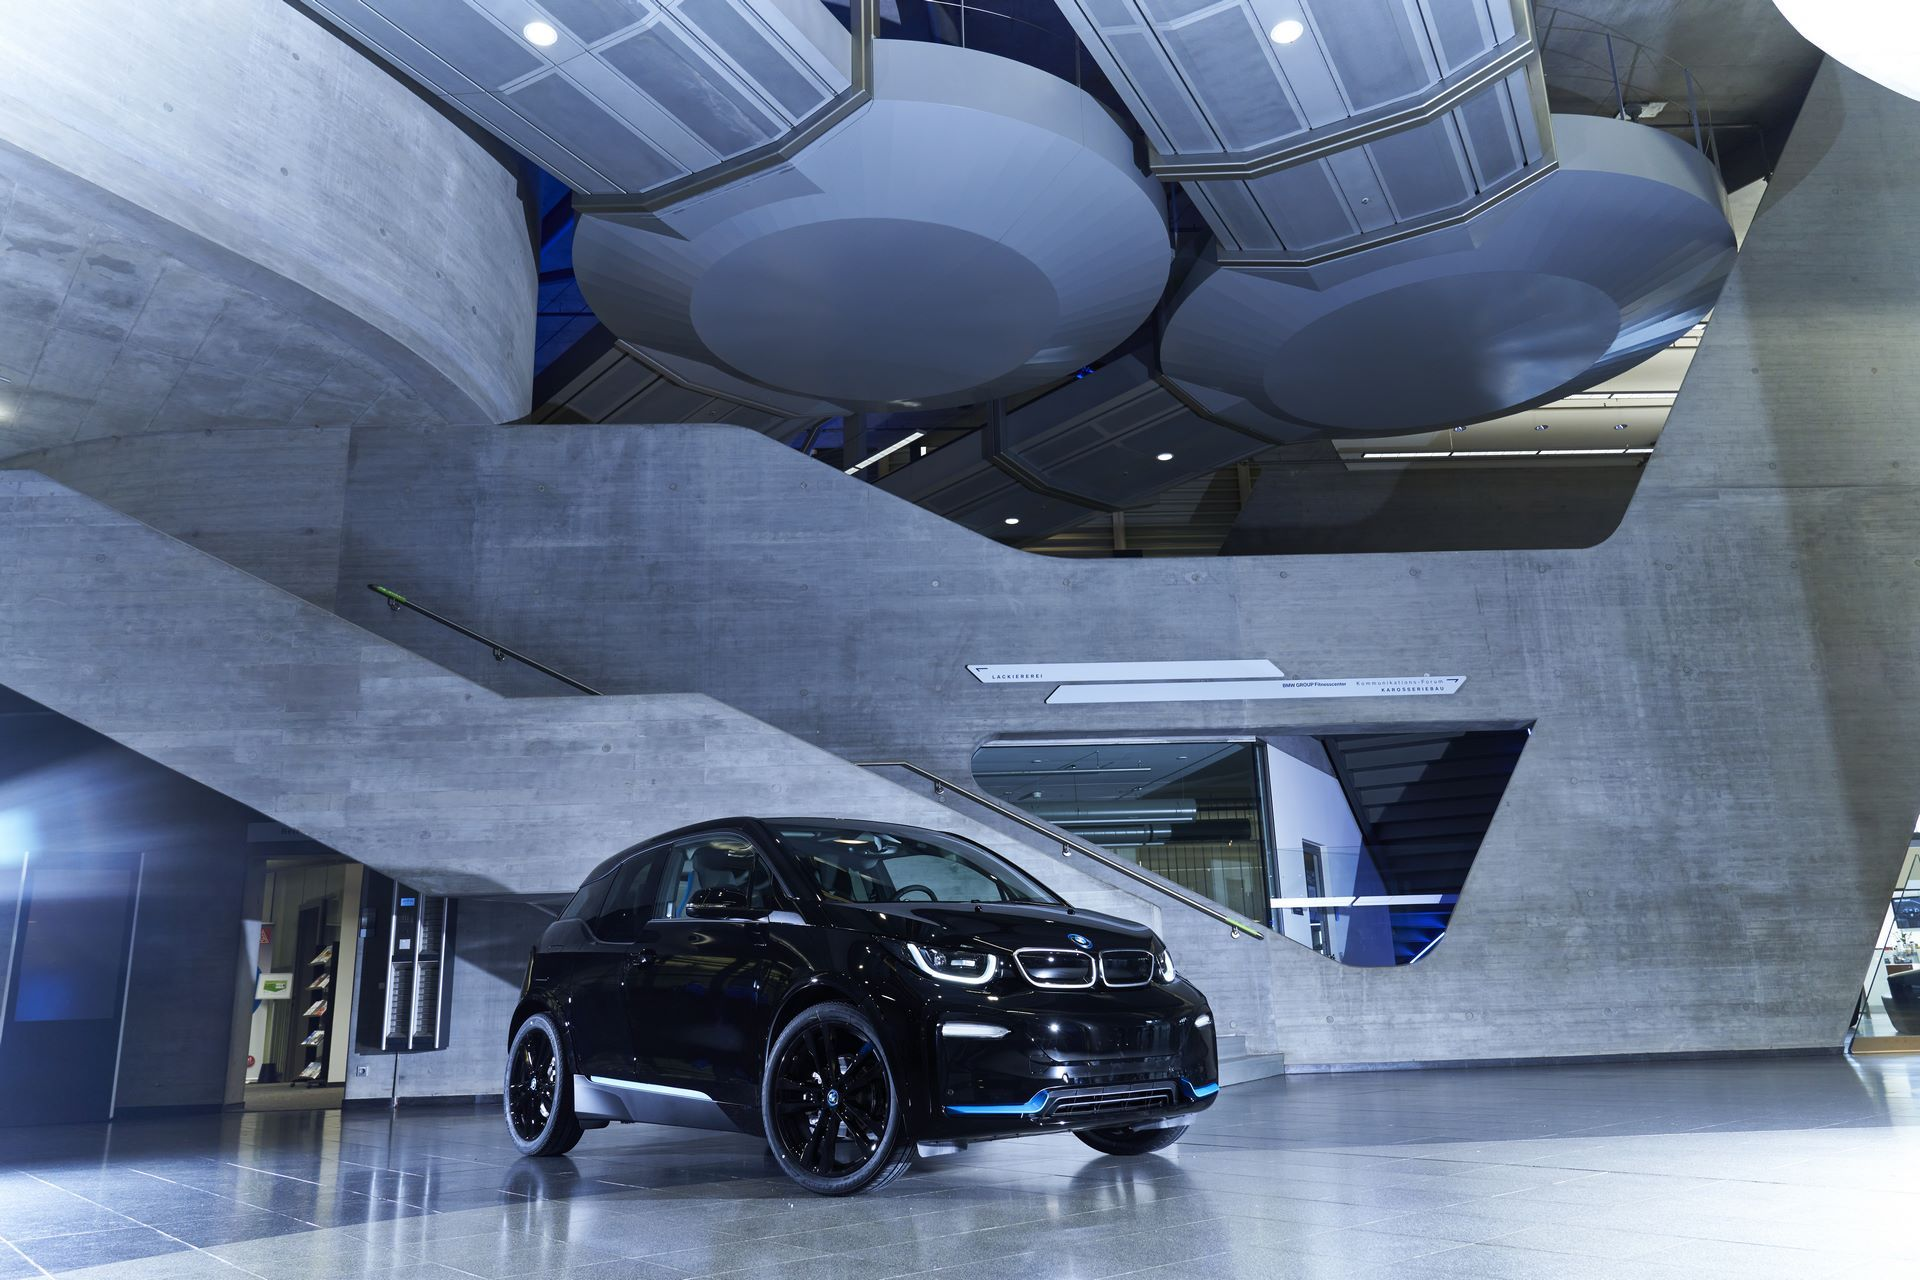 BMW-i8-plant-production-78